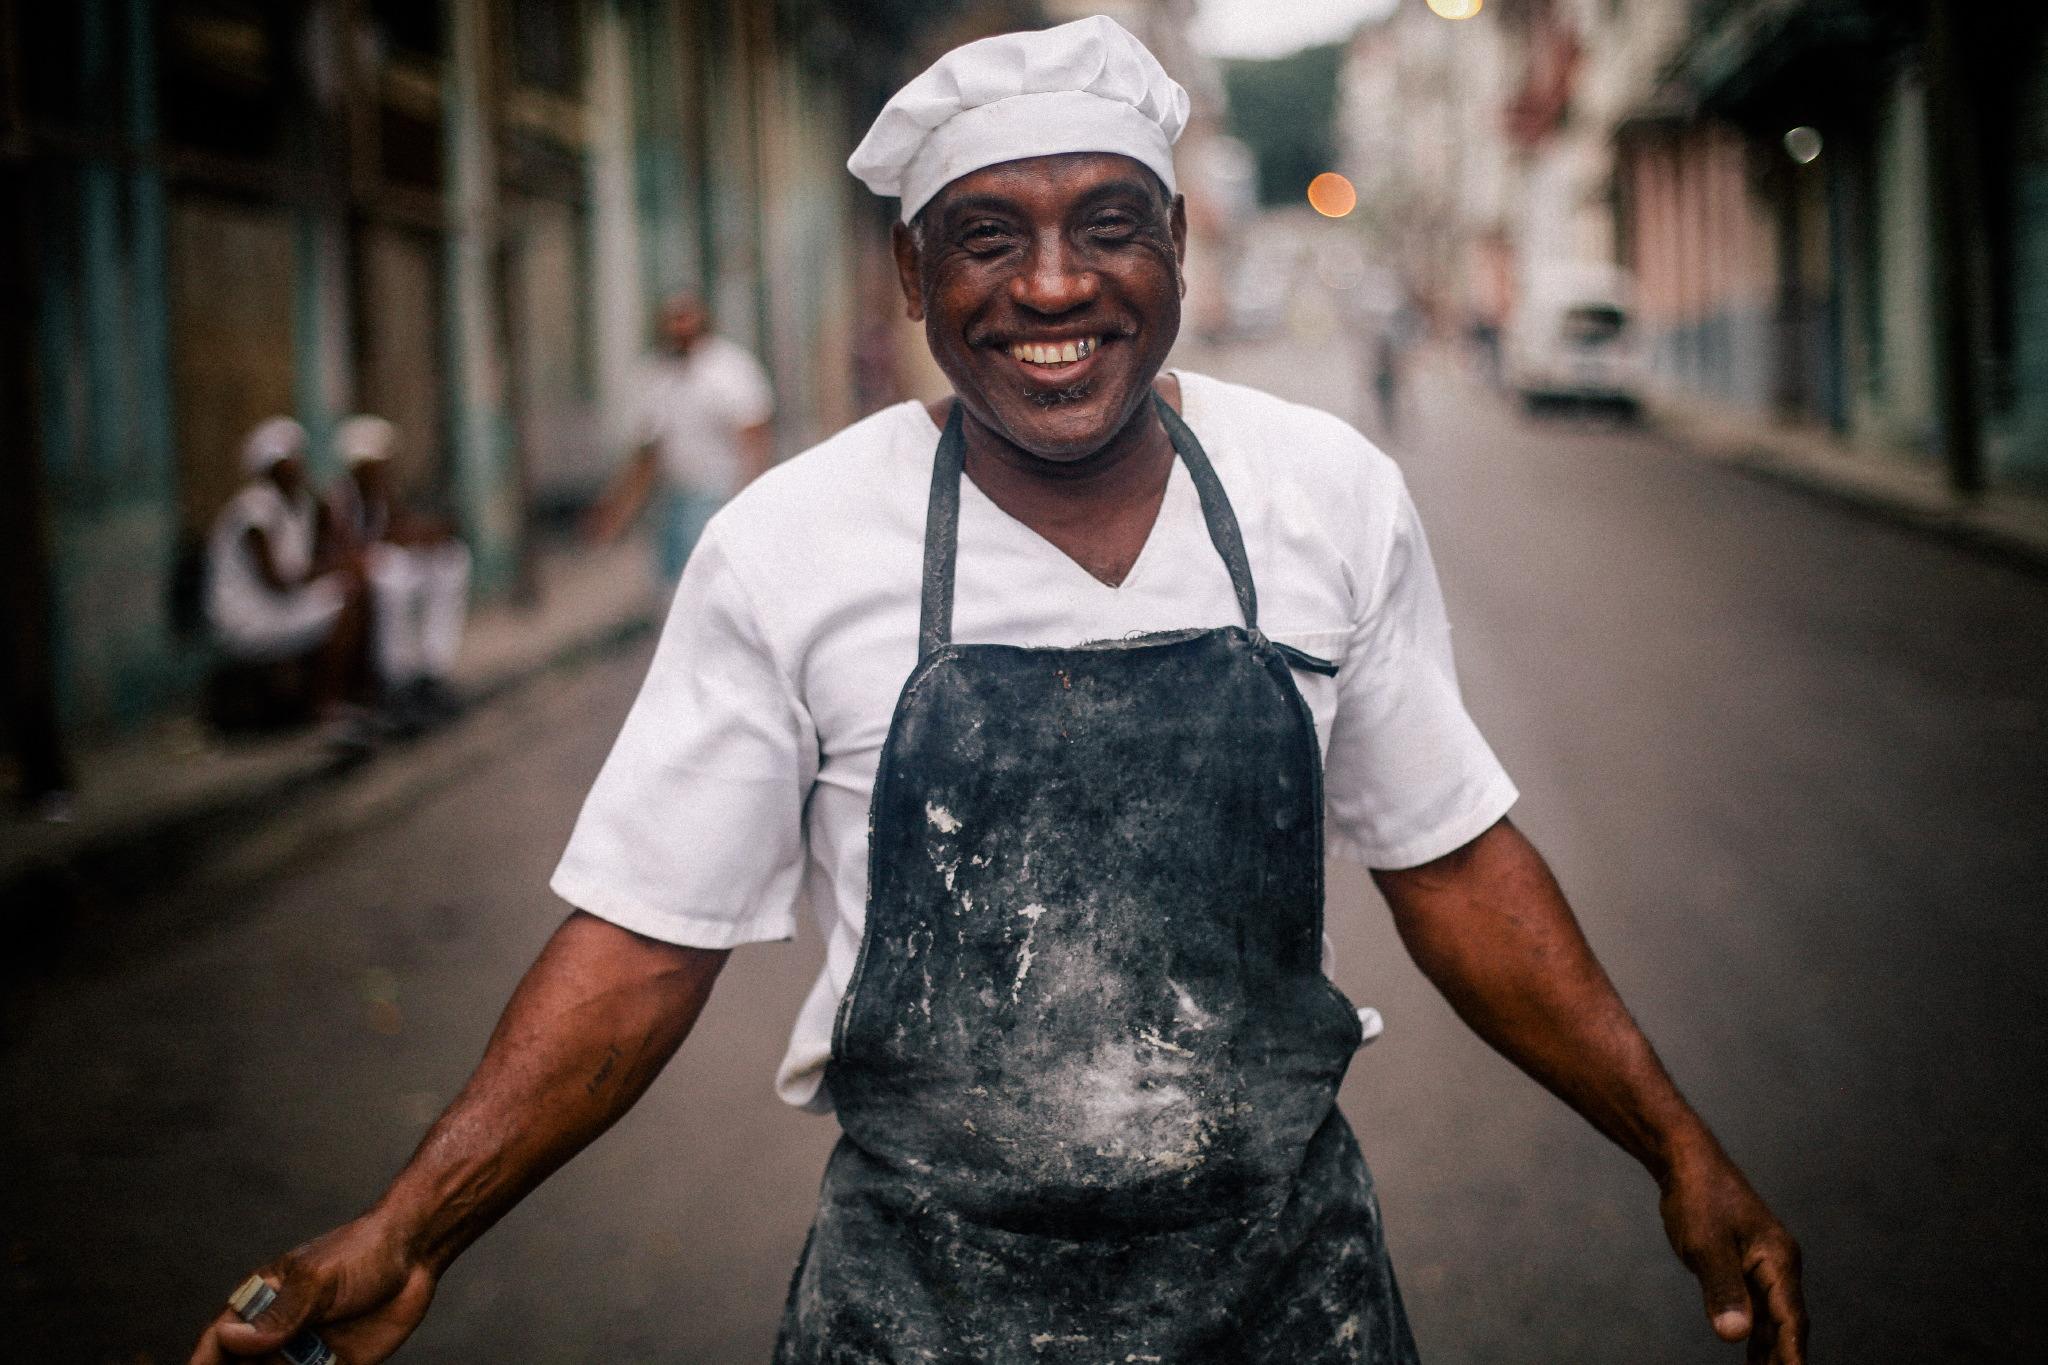 san diego wedding   photographer | baker with black apron smiling